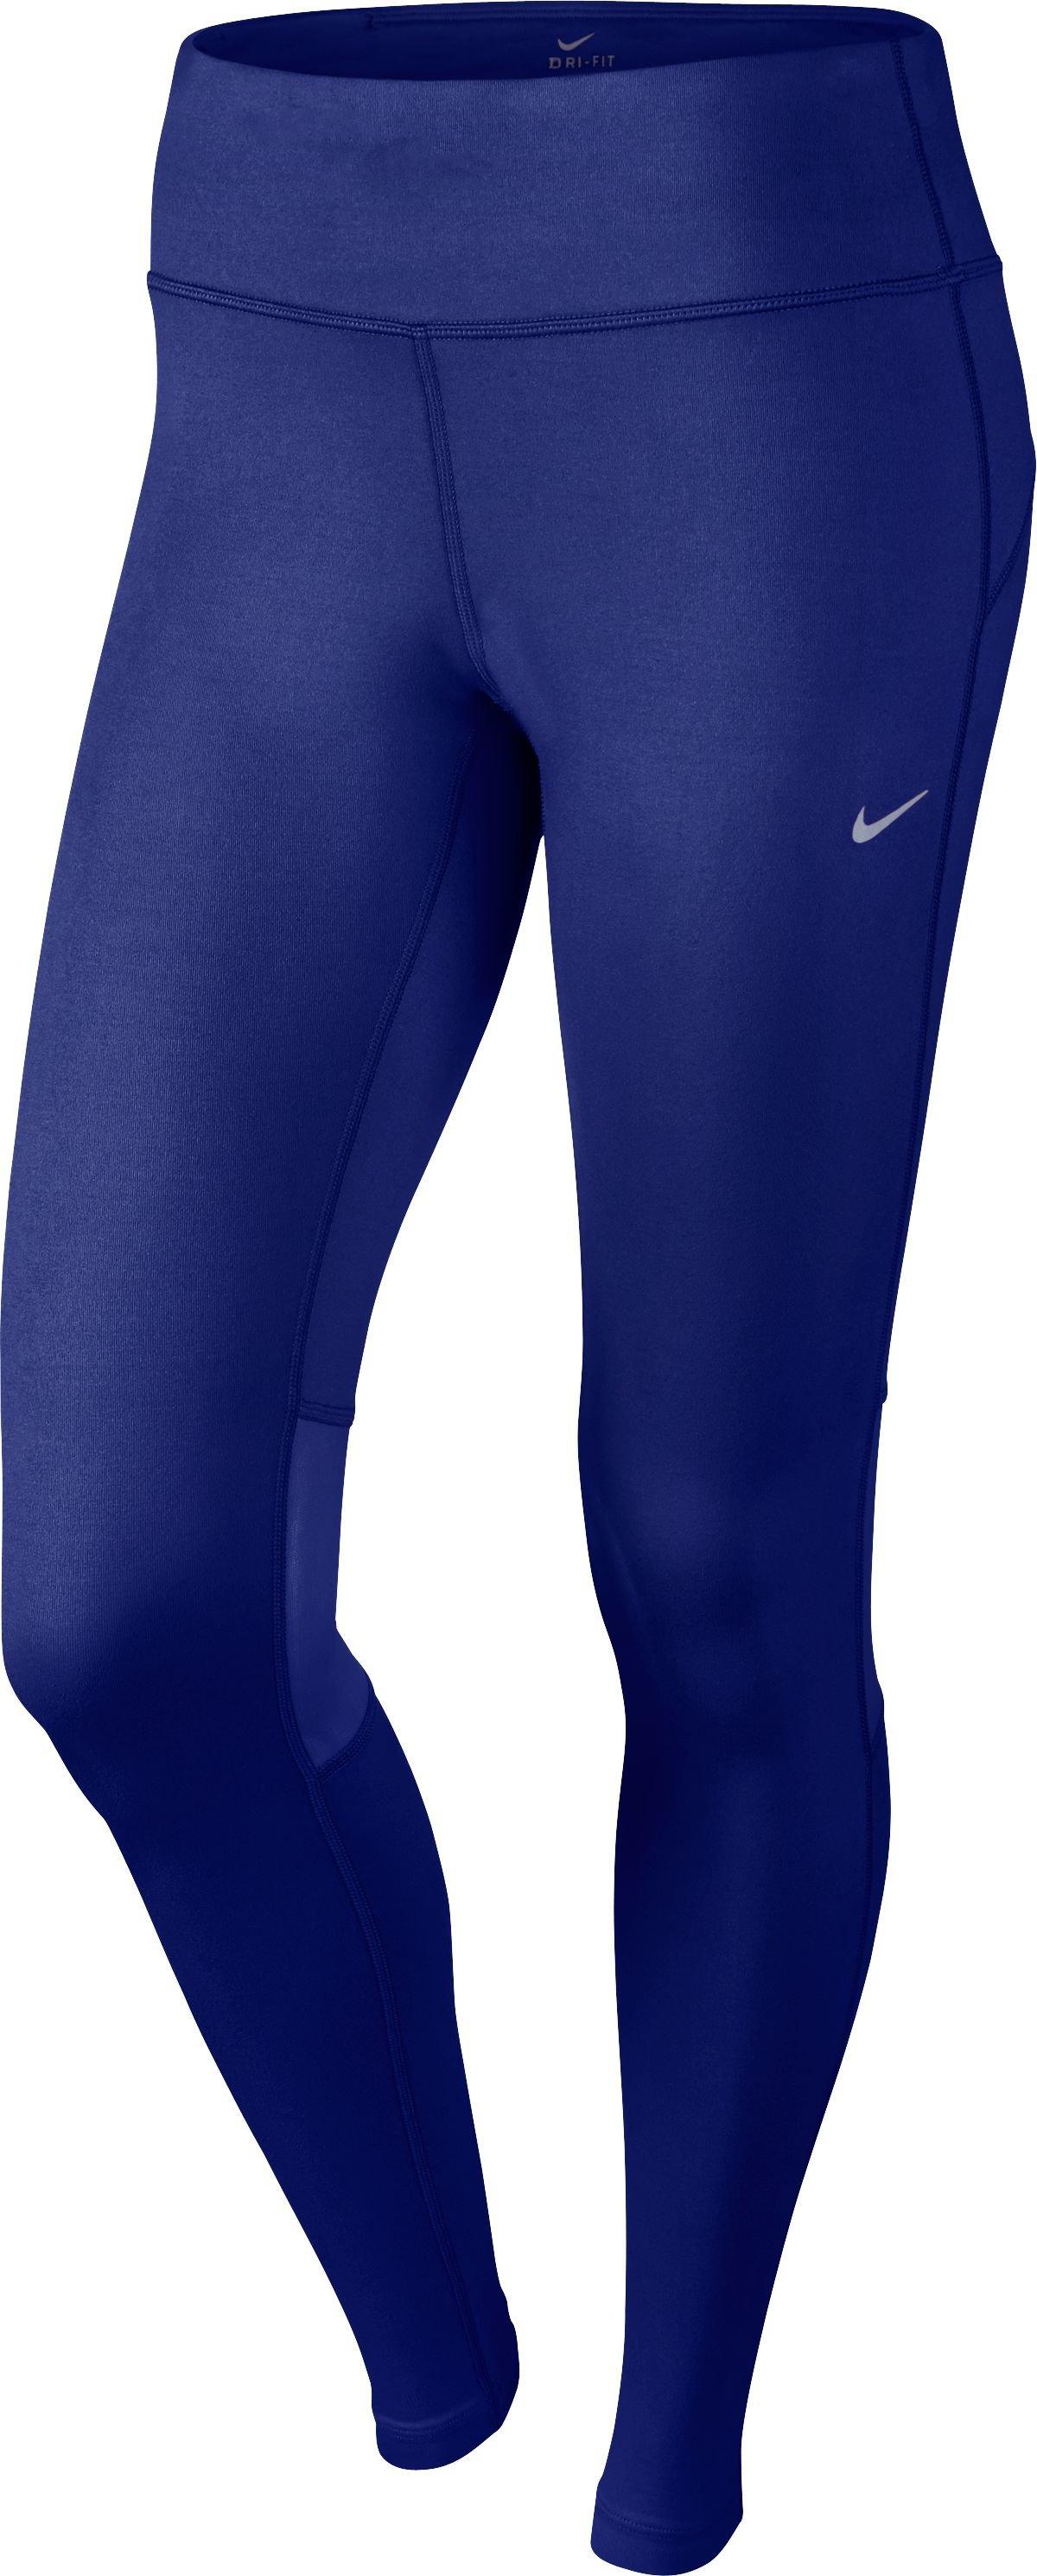 Kalhoty Nike DF EPIC RUN TIGHT